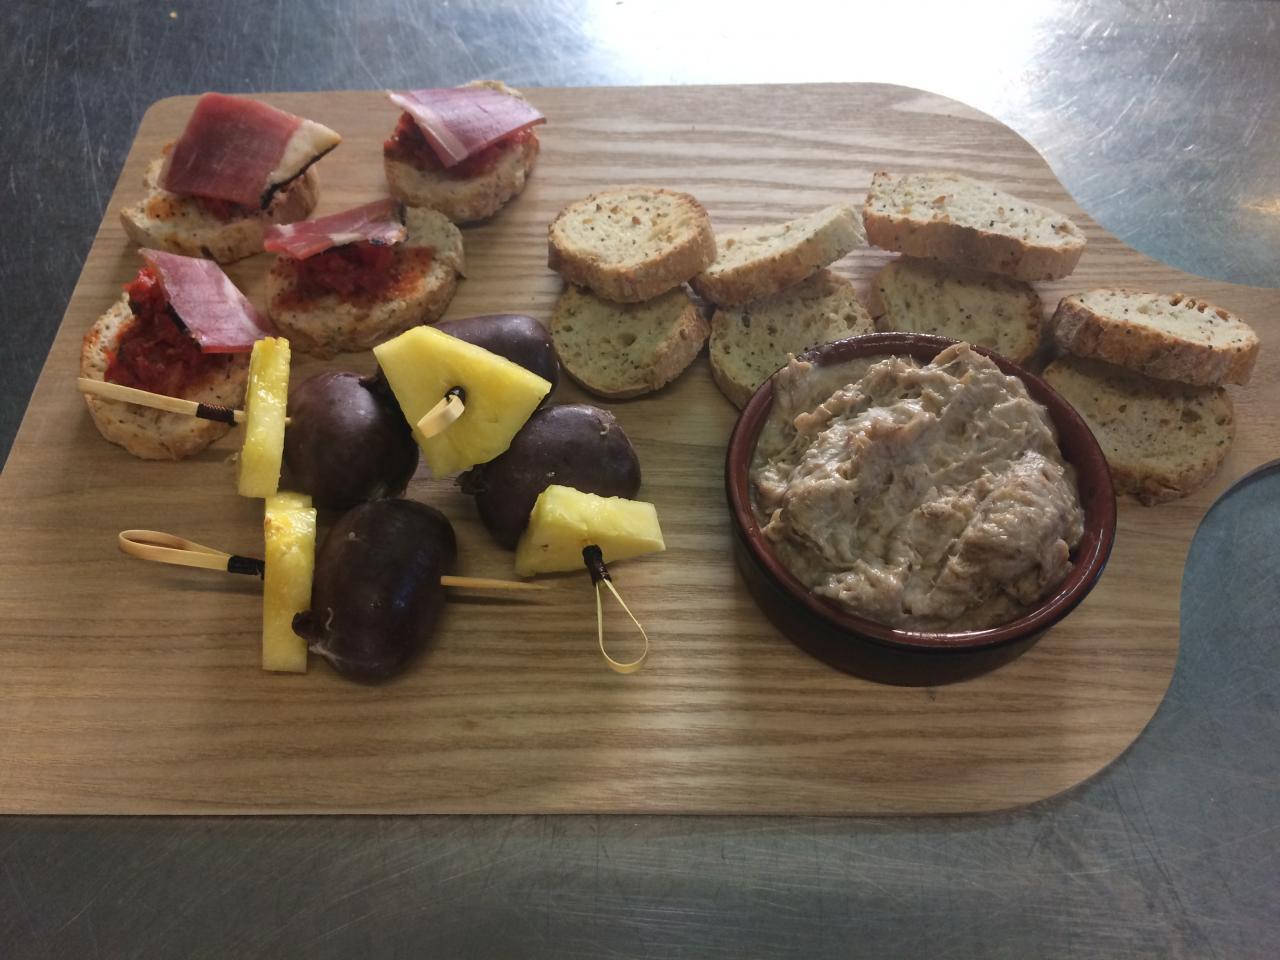 Brochette de boudin Antillais et ananas-Rillette d'oie-Bruschetta au jambon corse